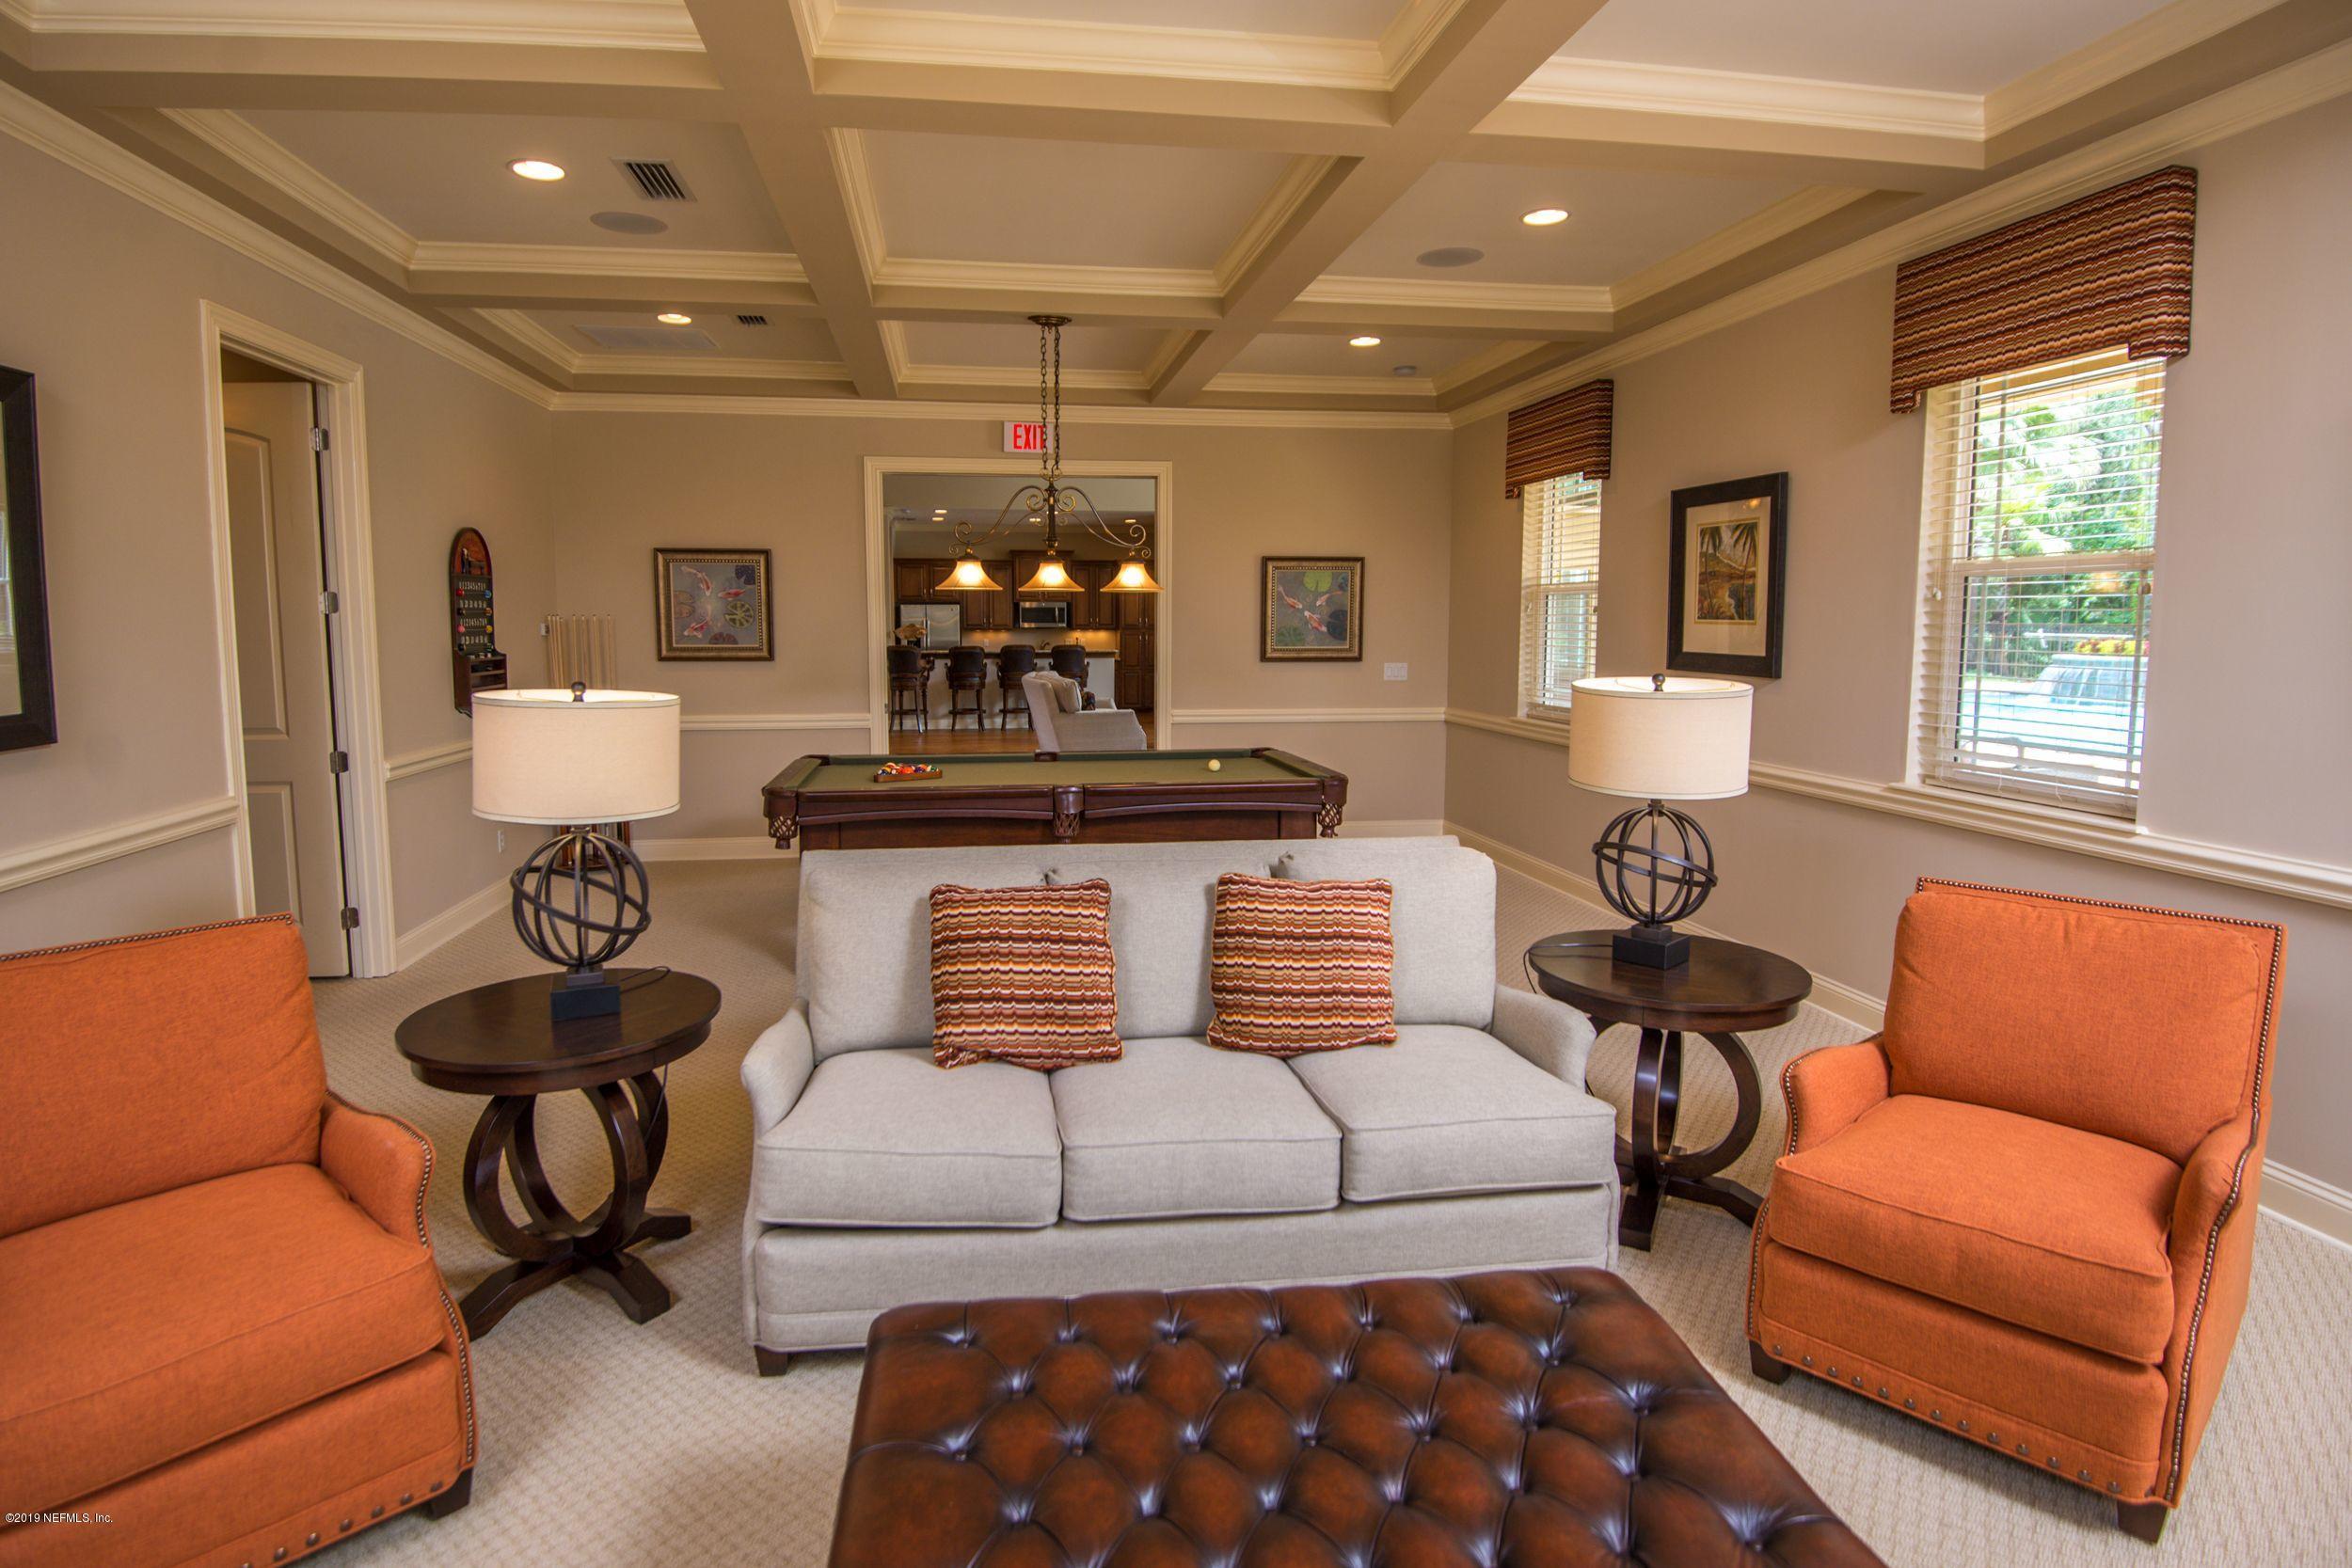 31 UTINA, ST AUGUSTINE, FLORIDA 32084, 2 Bedrooms Bedrooms, ,2 BathroomsBathrooms,Condo,For sale,UTINA,981644